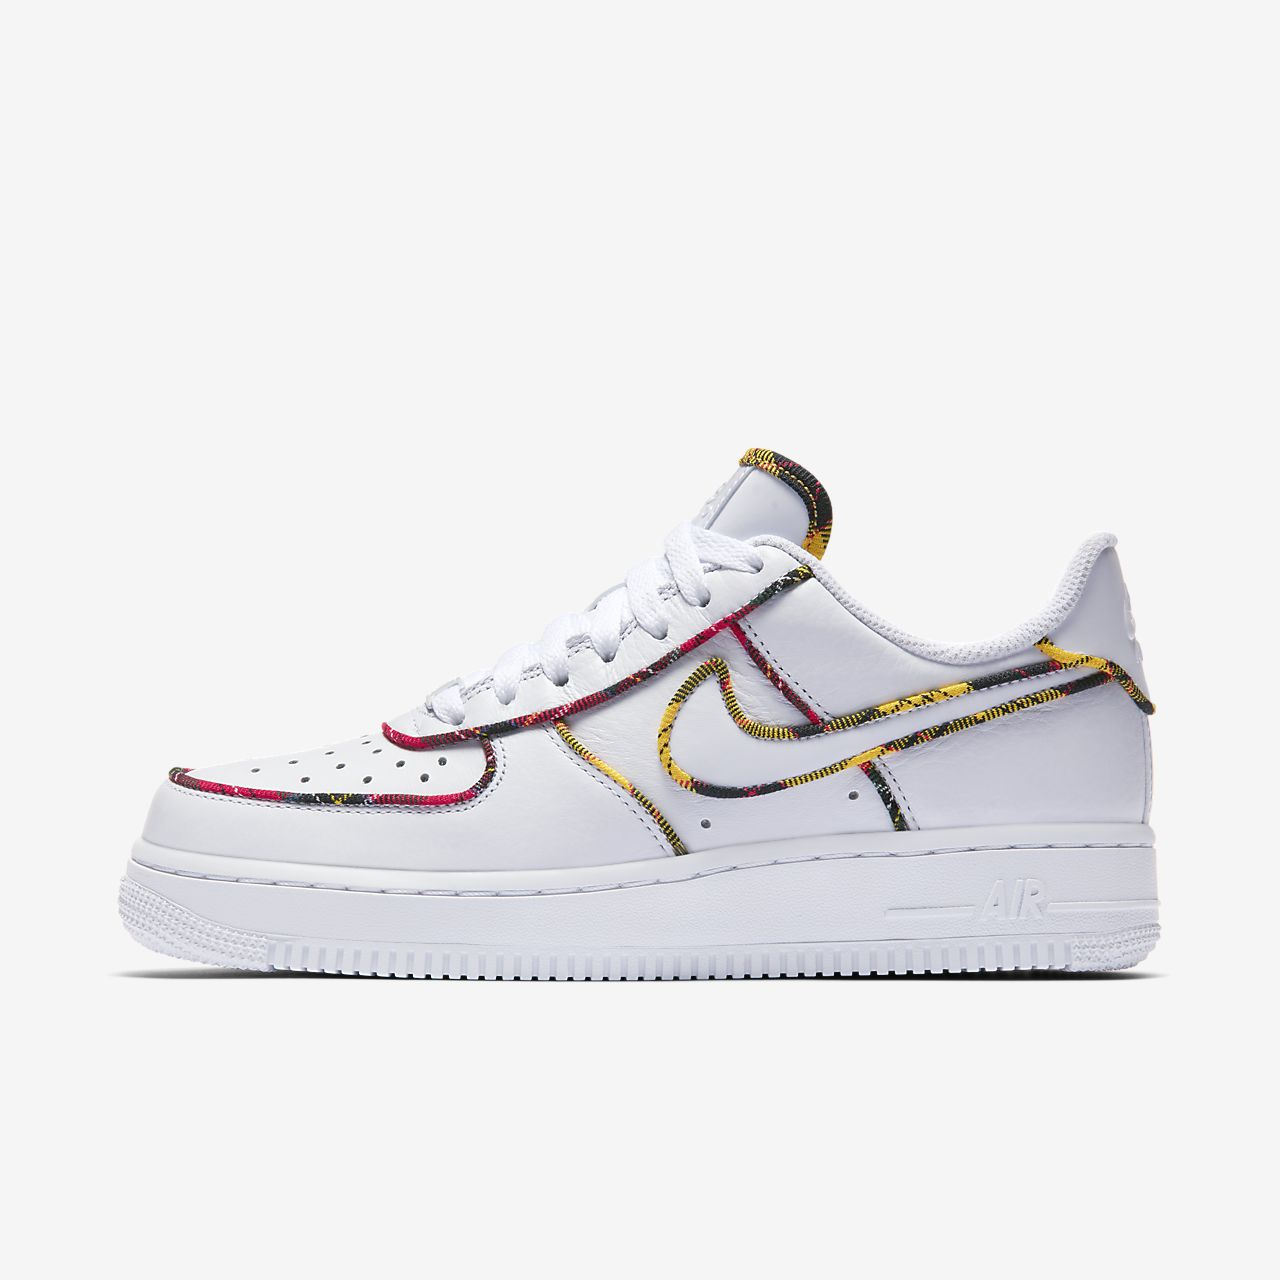 Calzado Force para mujer Nike Air Force Calzado 1 CL 7d682e